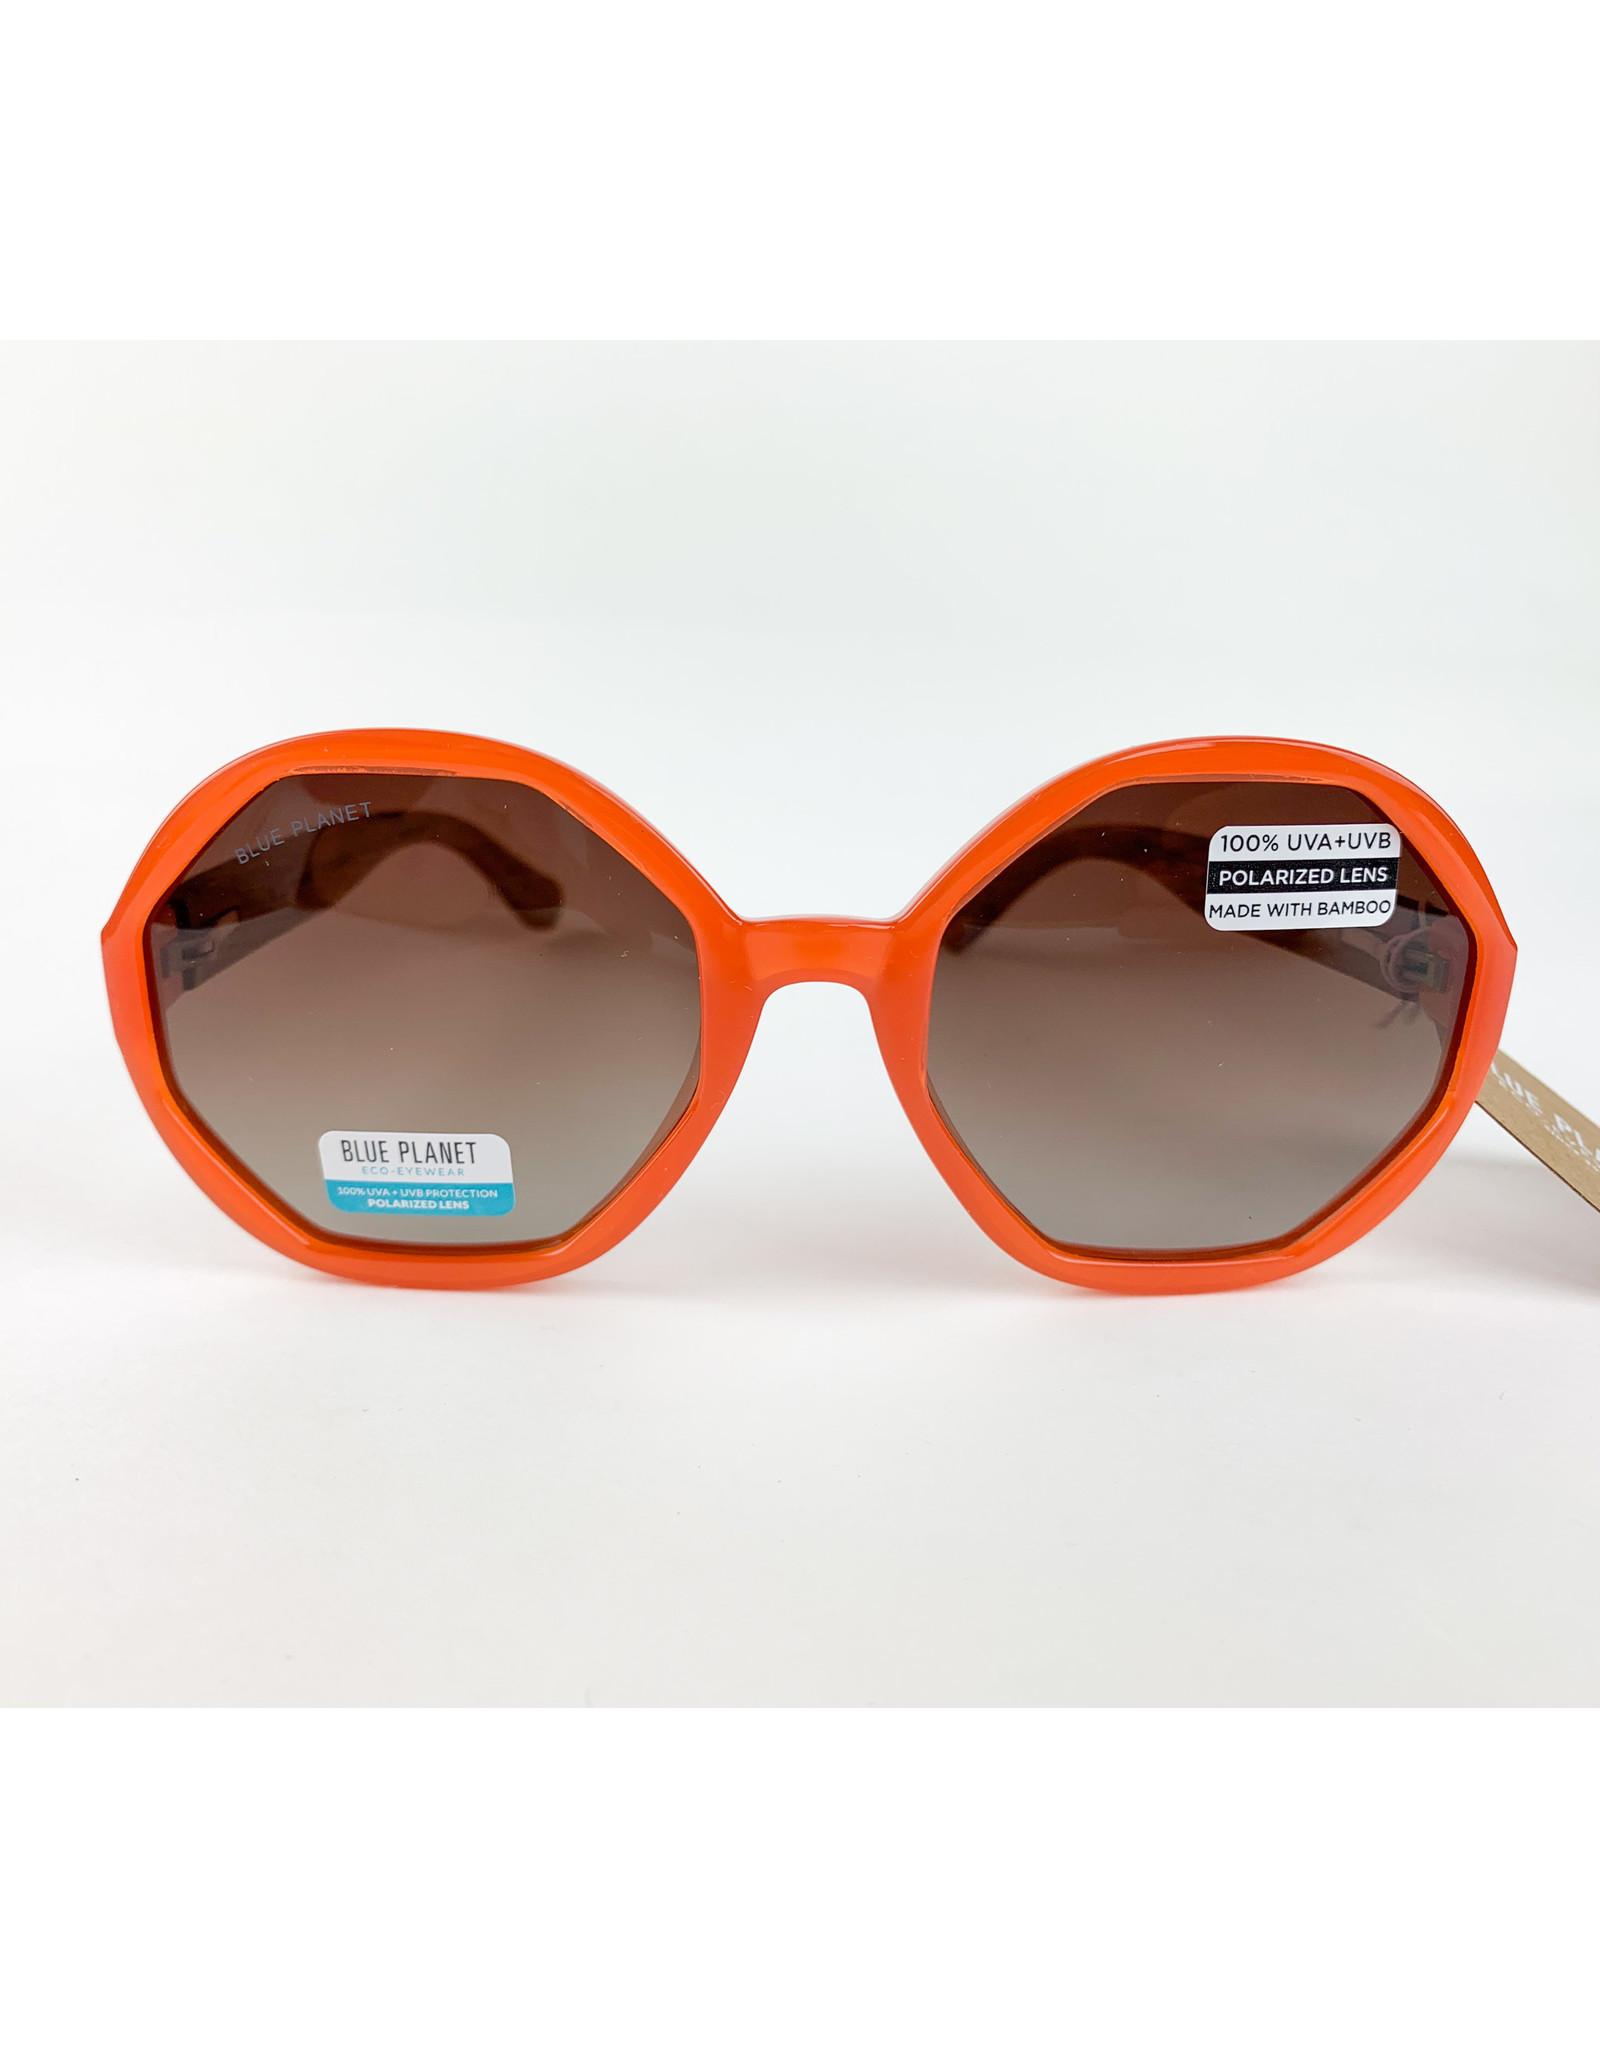 Blue Planet Sunglasses Donna Tangerine